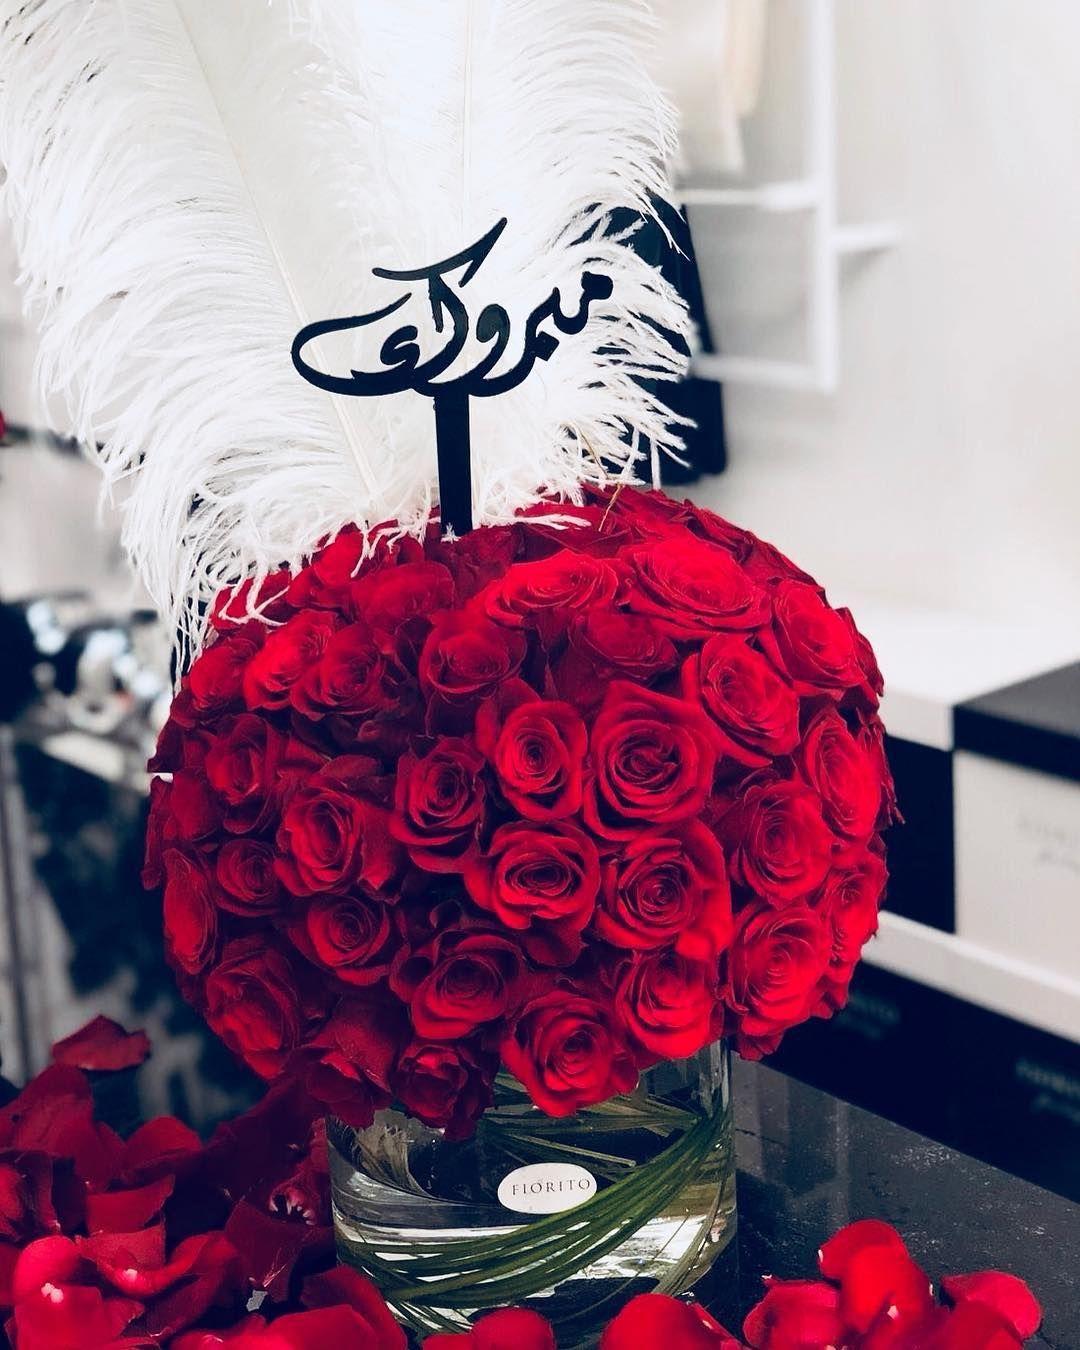 Fiorito Flower Boutique On Instagram تذكرني اذا صار الورد جوري Flower Boutique Forarm Tattoos Flowers